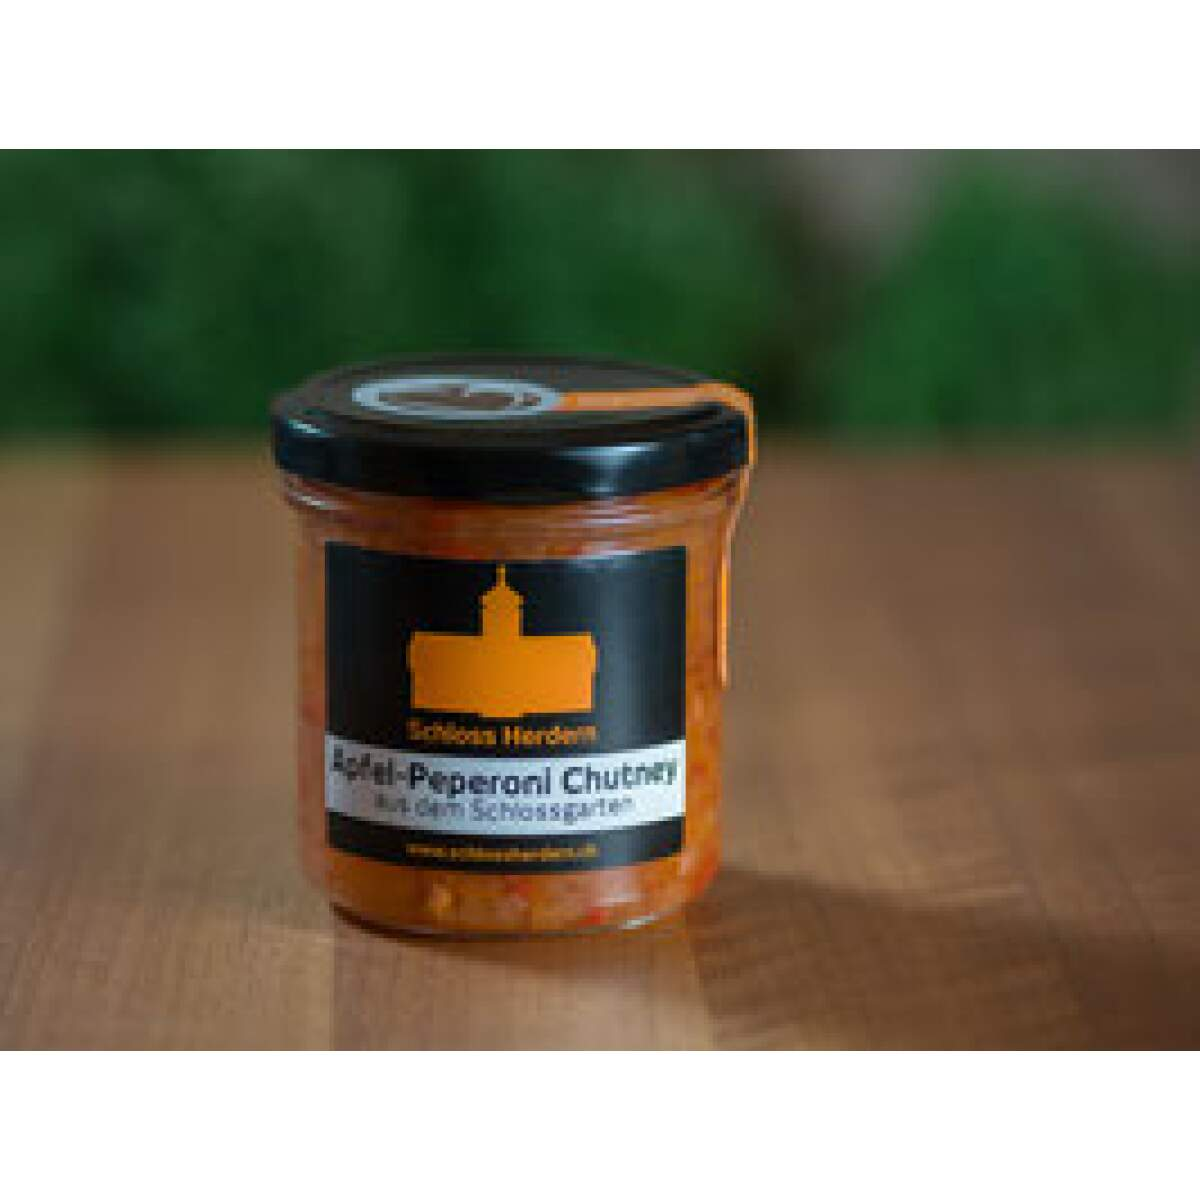 Apfel-Peperoni-Chutney-1